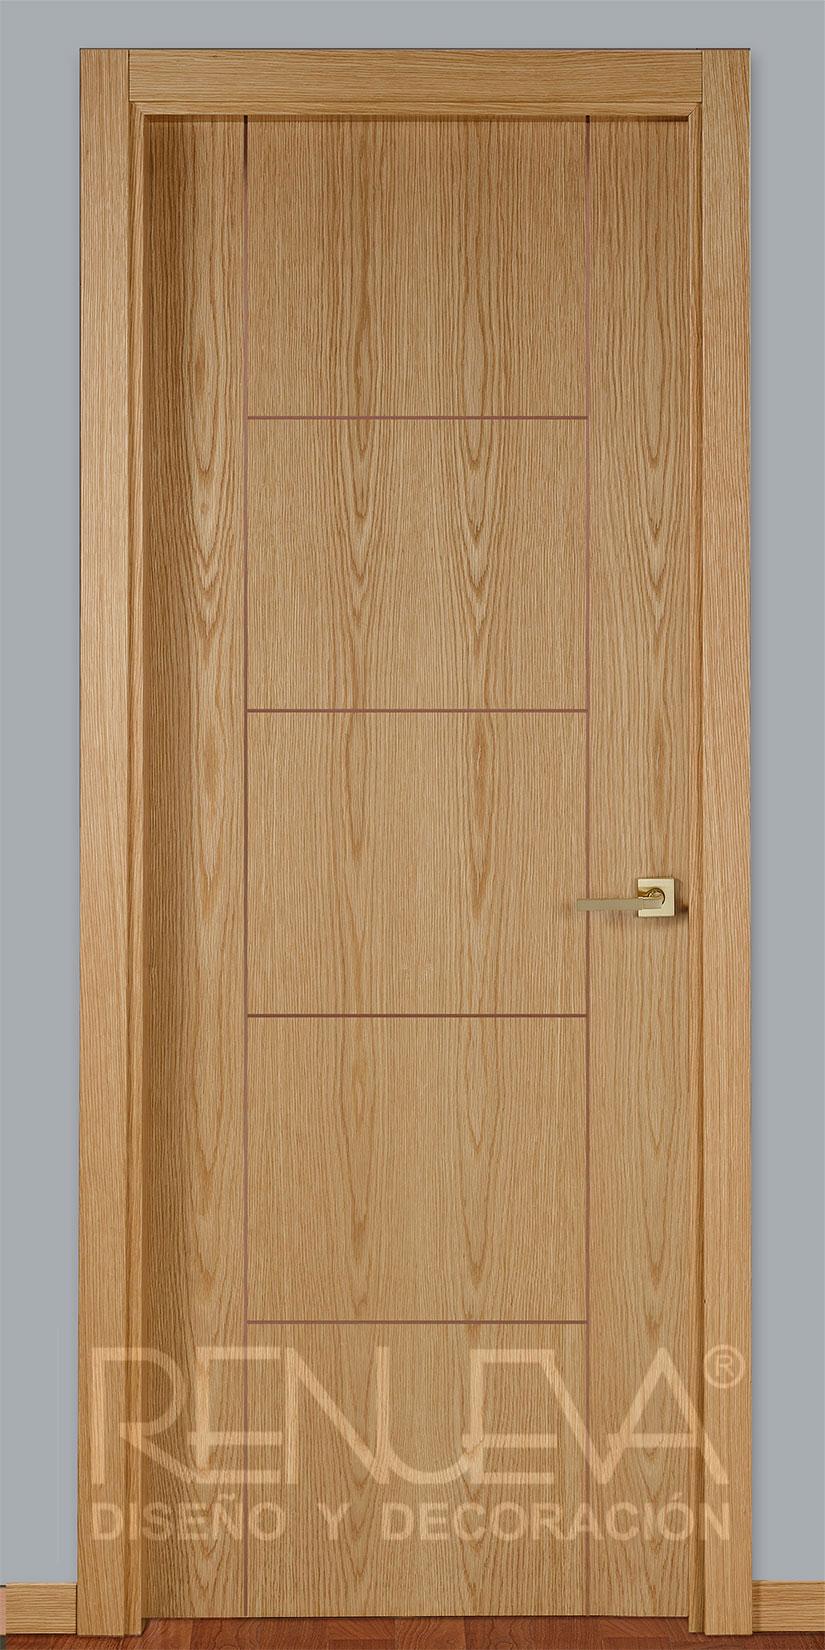 Oferta puerta madera de roble barnizada modelo rp5 for Puerta madera roble